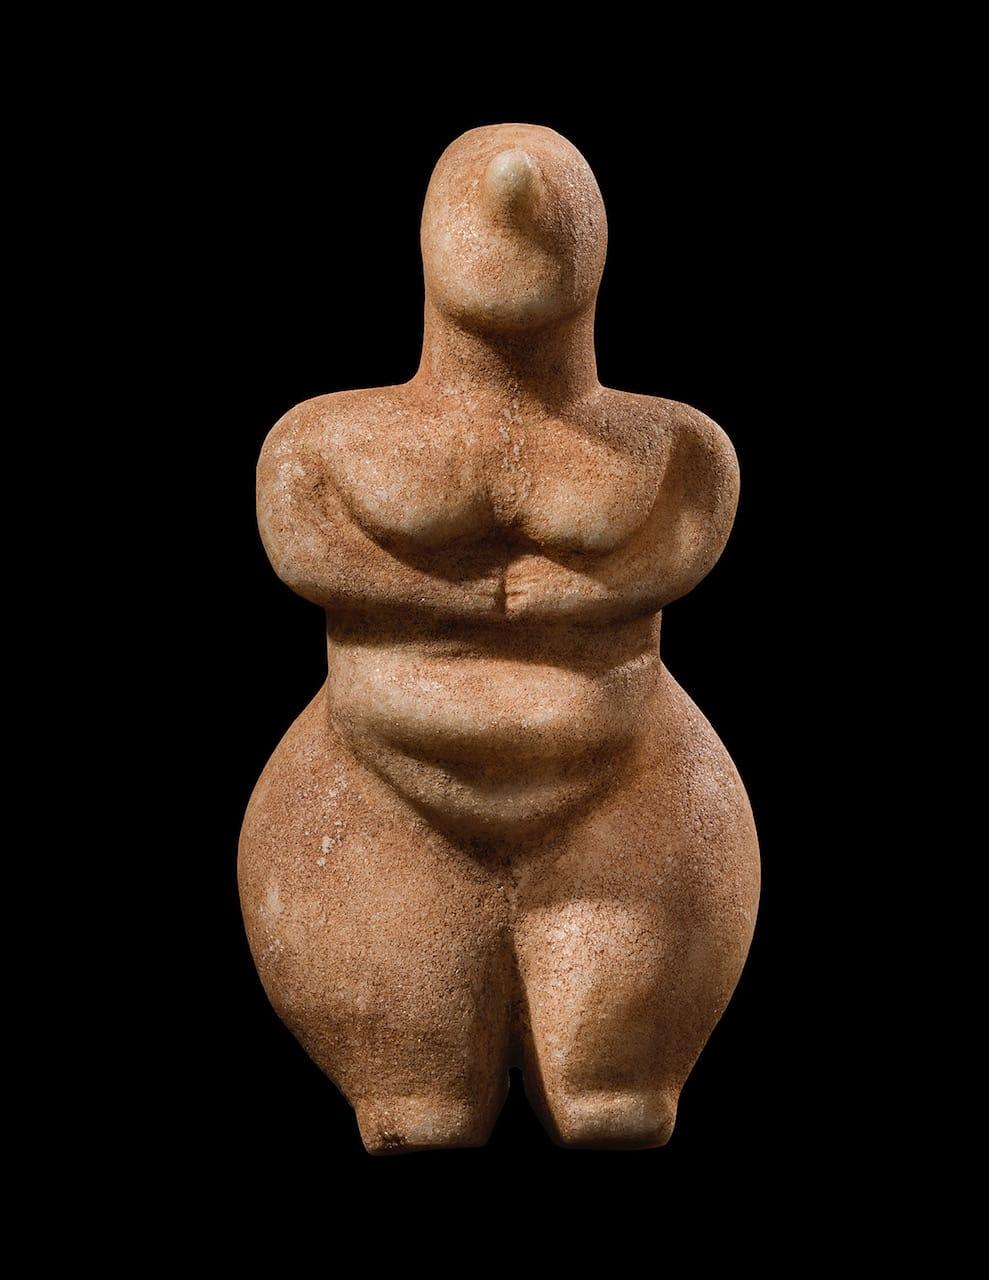 4. Fertility Figure Greek, Neolithic Period, fifth to fourth millennium B.C.